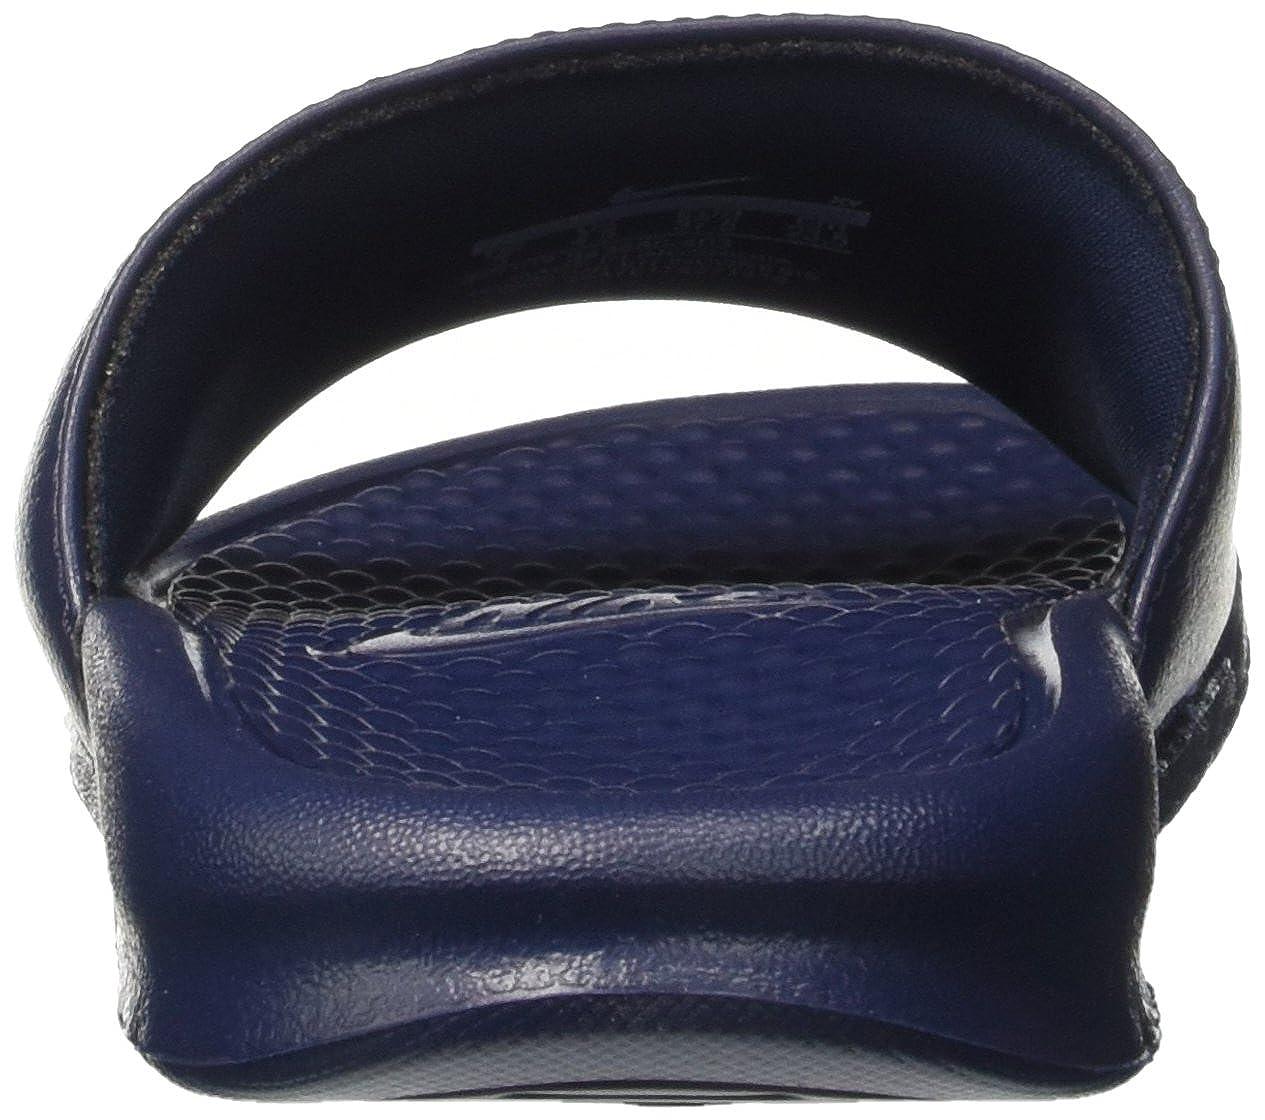 reputable site c83cb 3f324 Men s Shoes Sandals Nike Benassi JDI Just Do It Print Slides Total Orange  White Black 631261-800